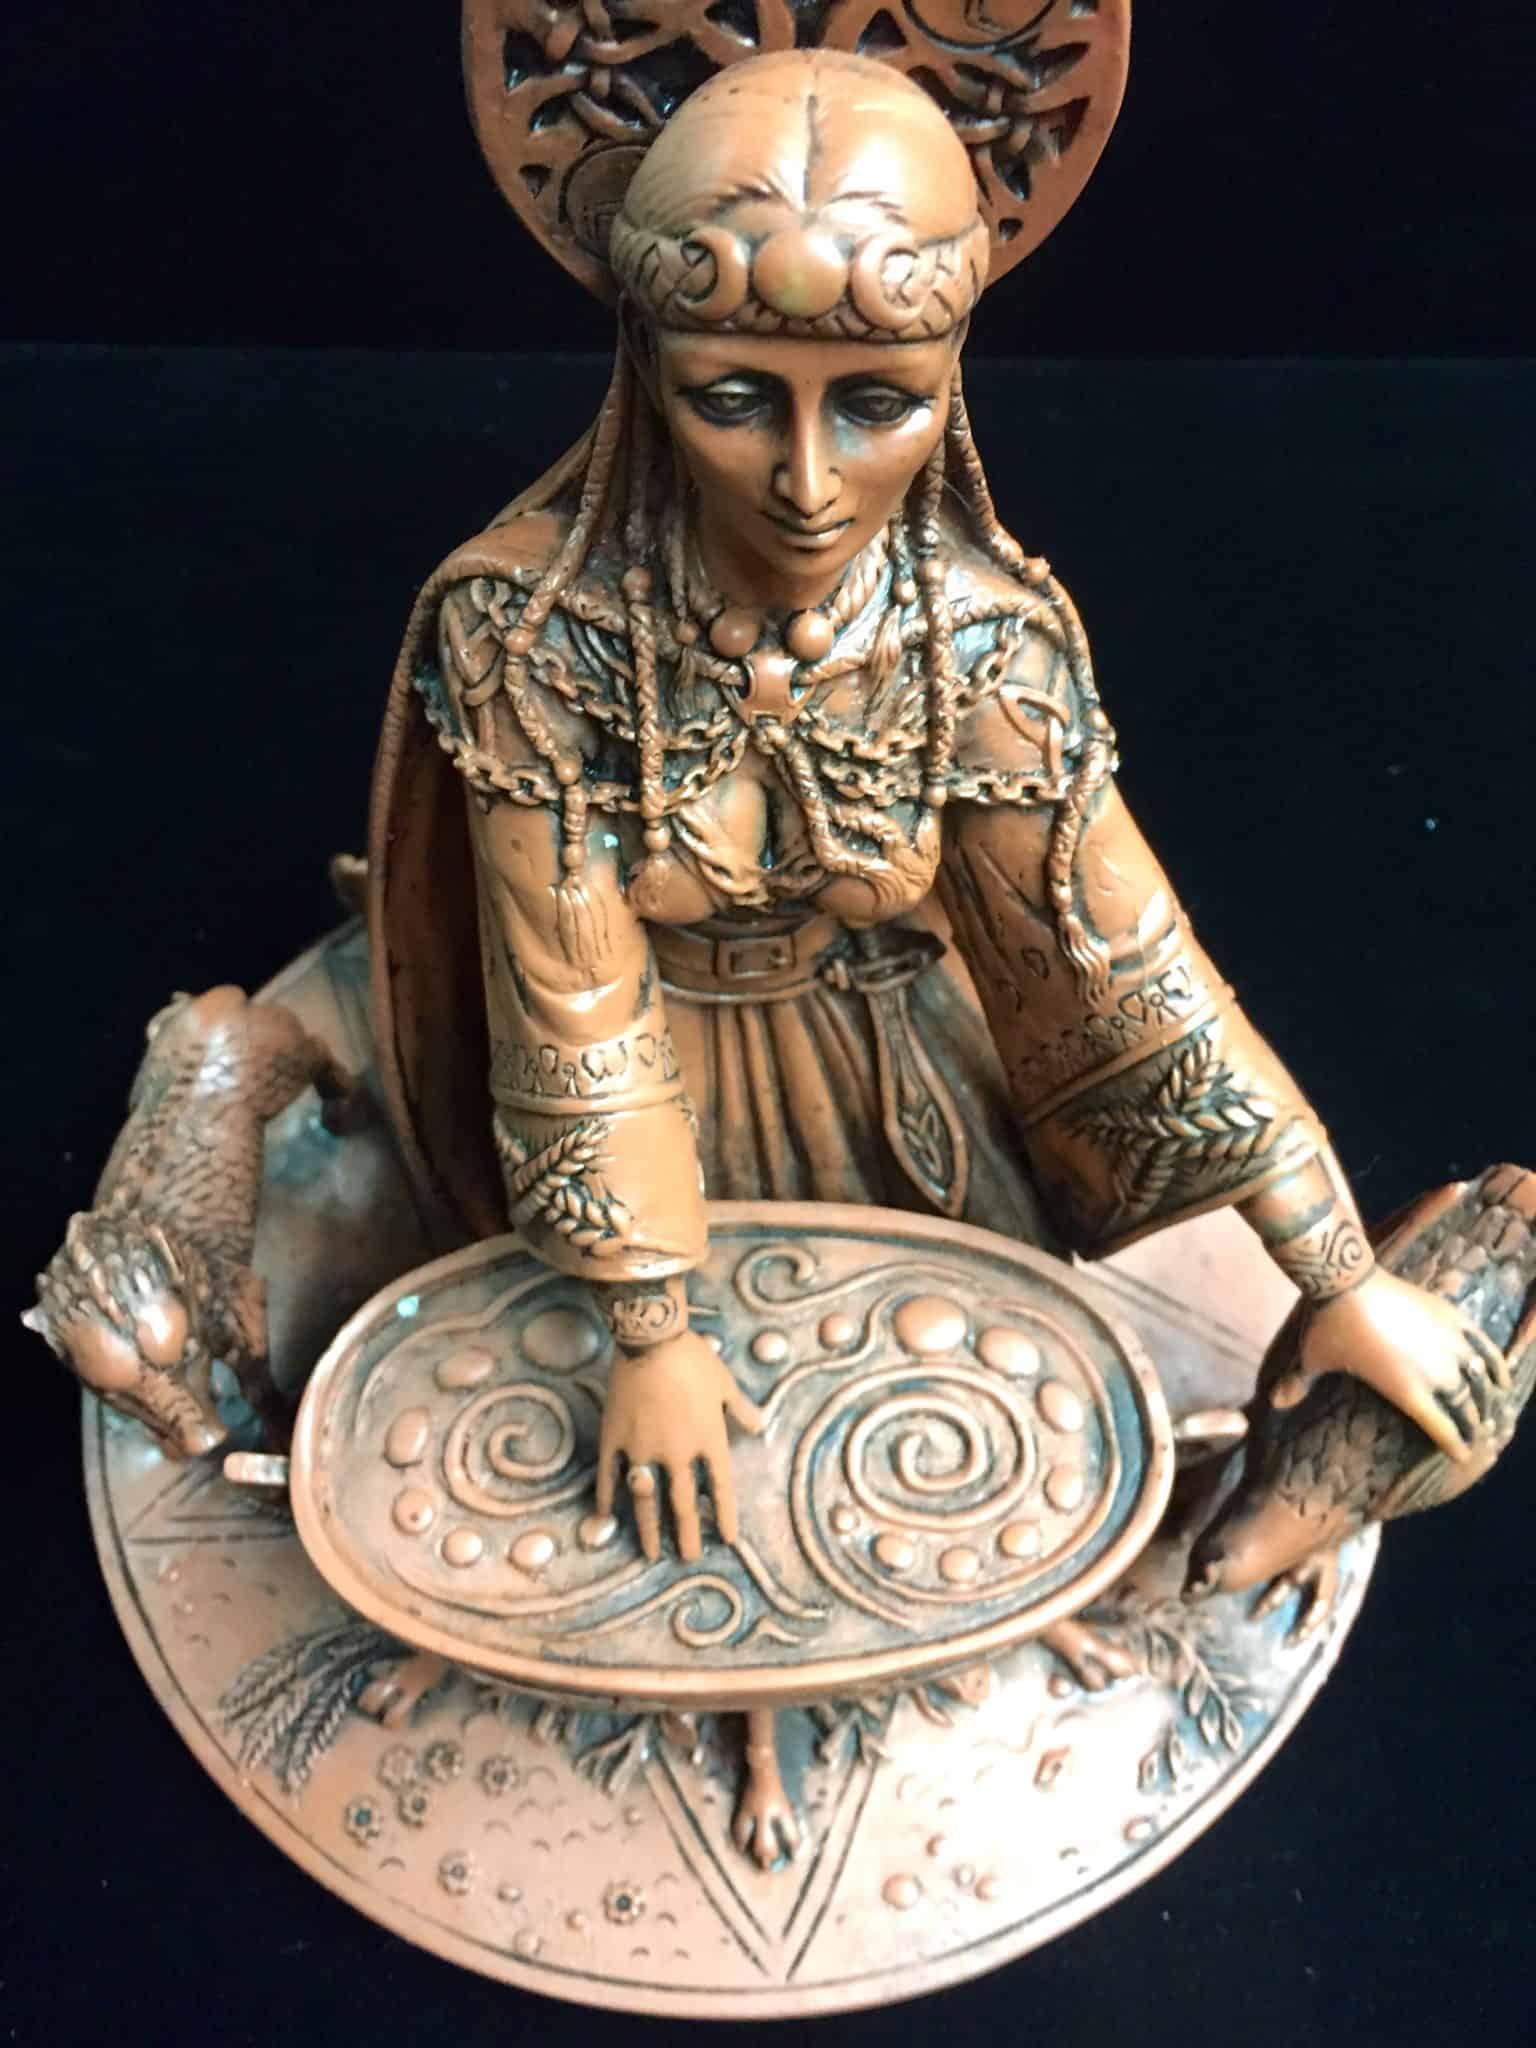 Celtic Crone Goddess Cerridwen Terracotta Resin Statue by Maxine Miller ©Maxine Miller - Front View 2